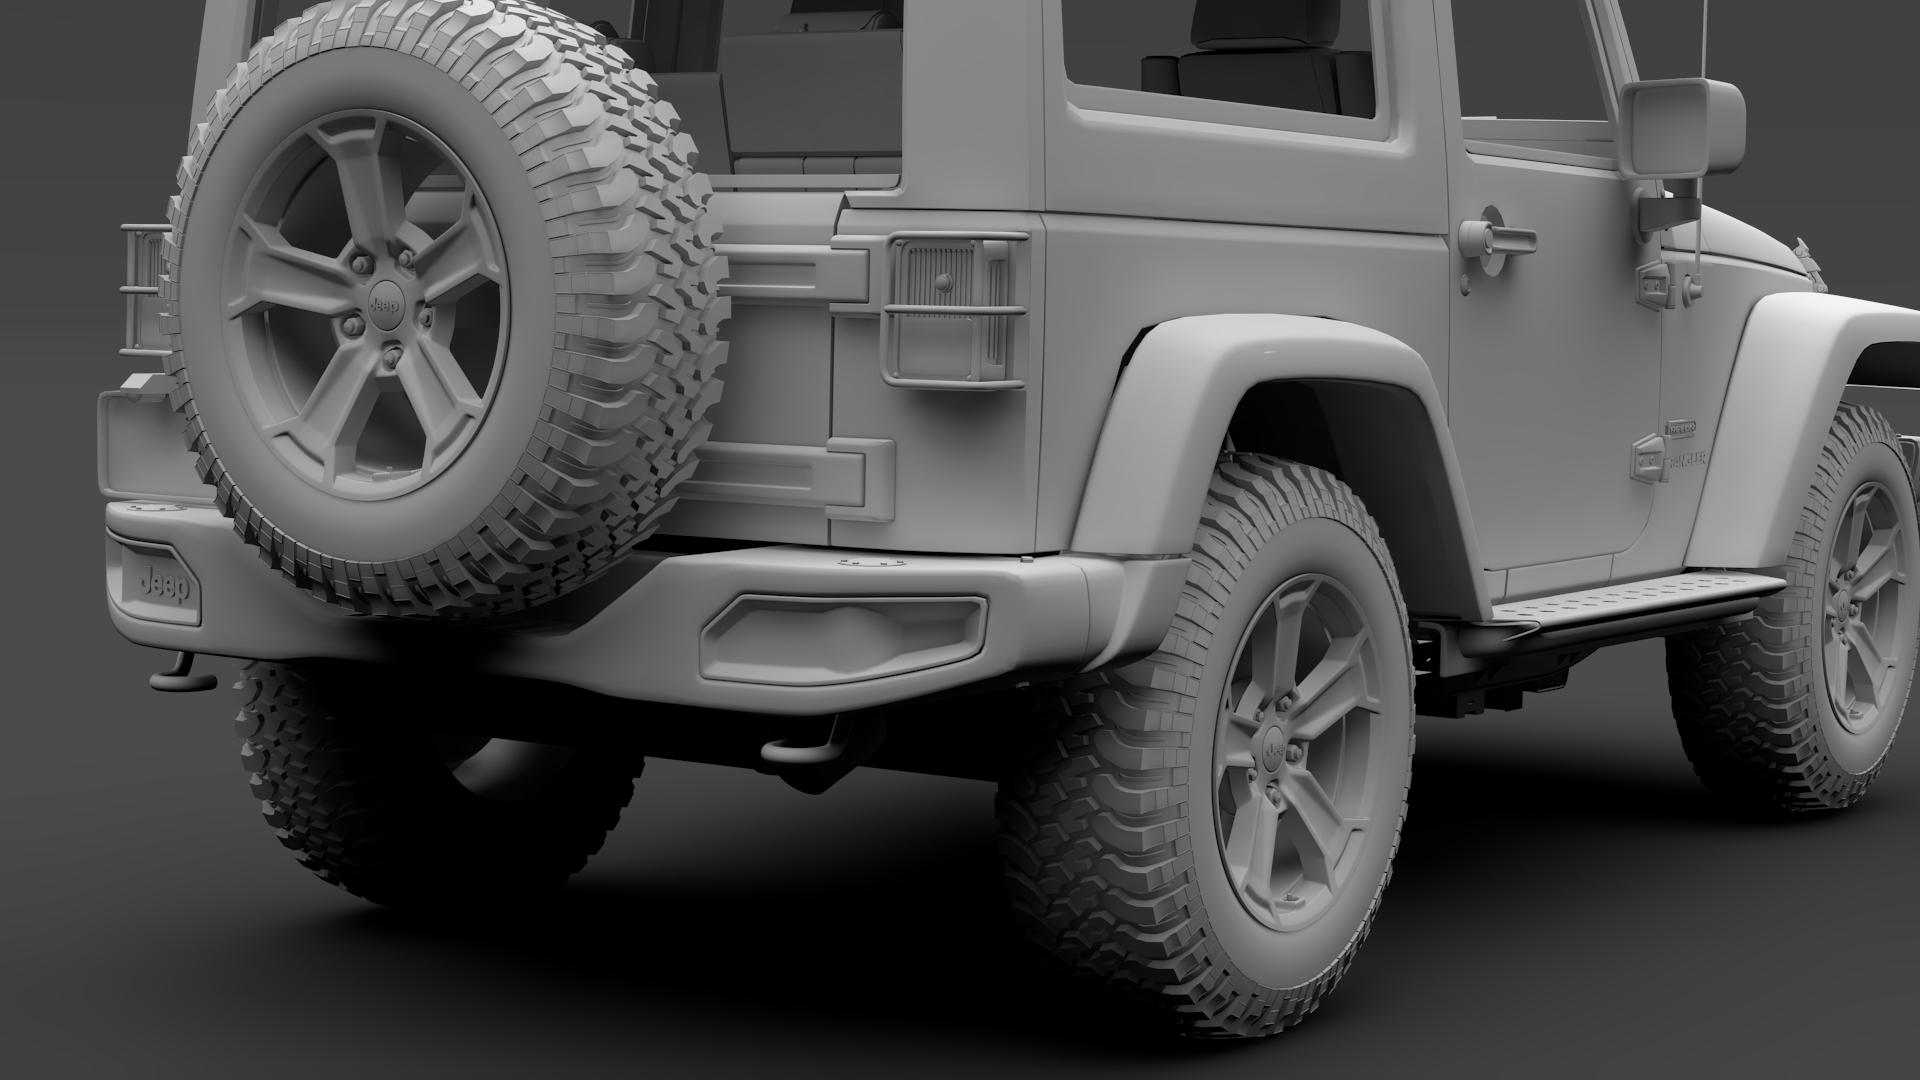 jeep wrangler rubicon recon jk 2017 3d model max fbx lwo ma mb hrc xsi obj 276959